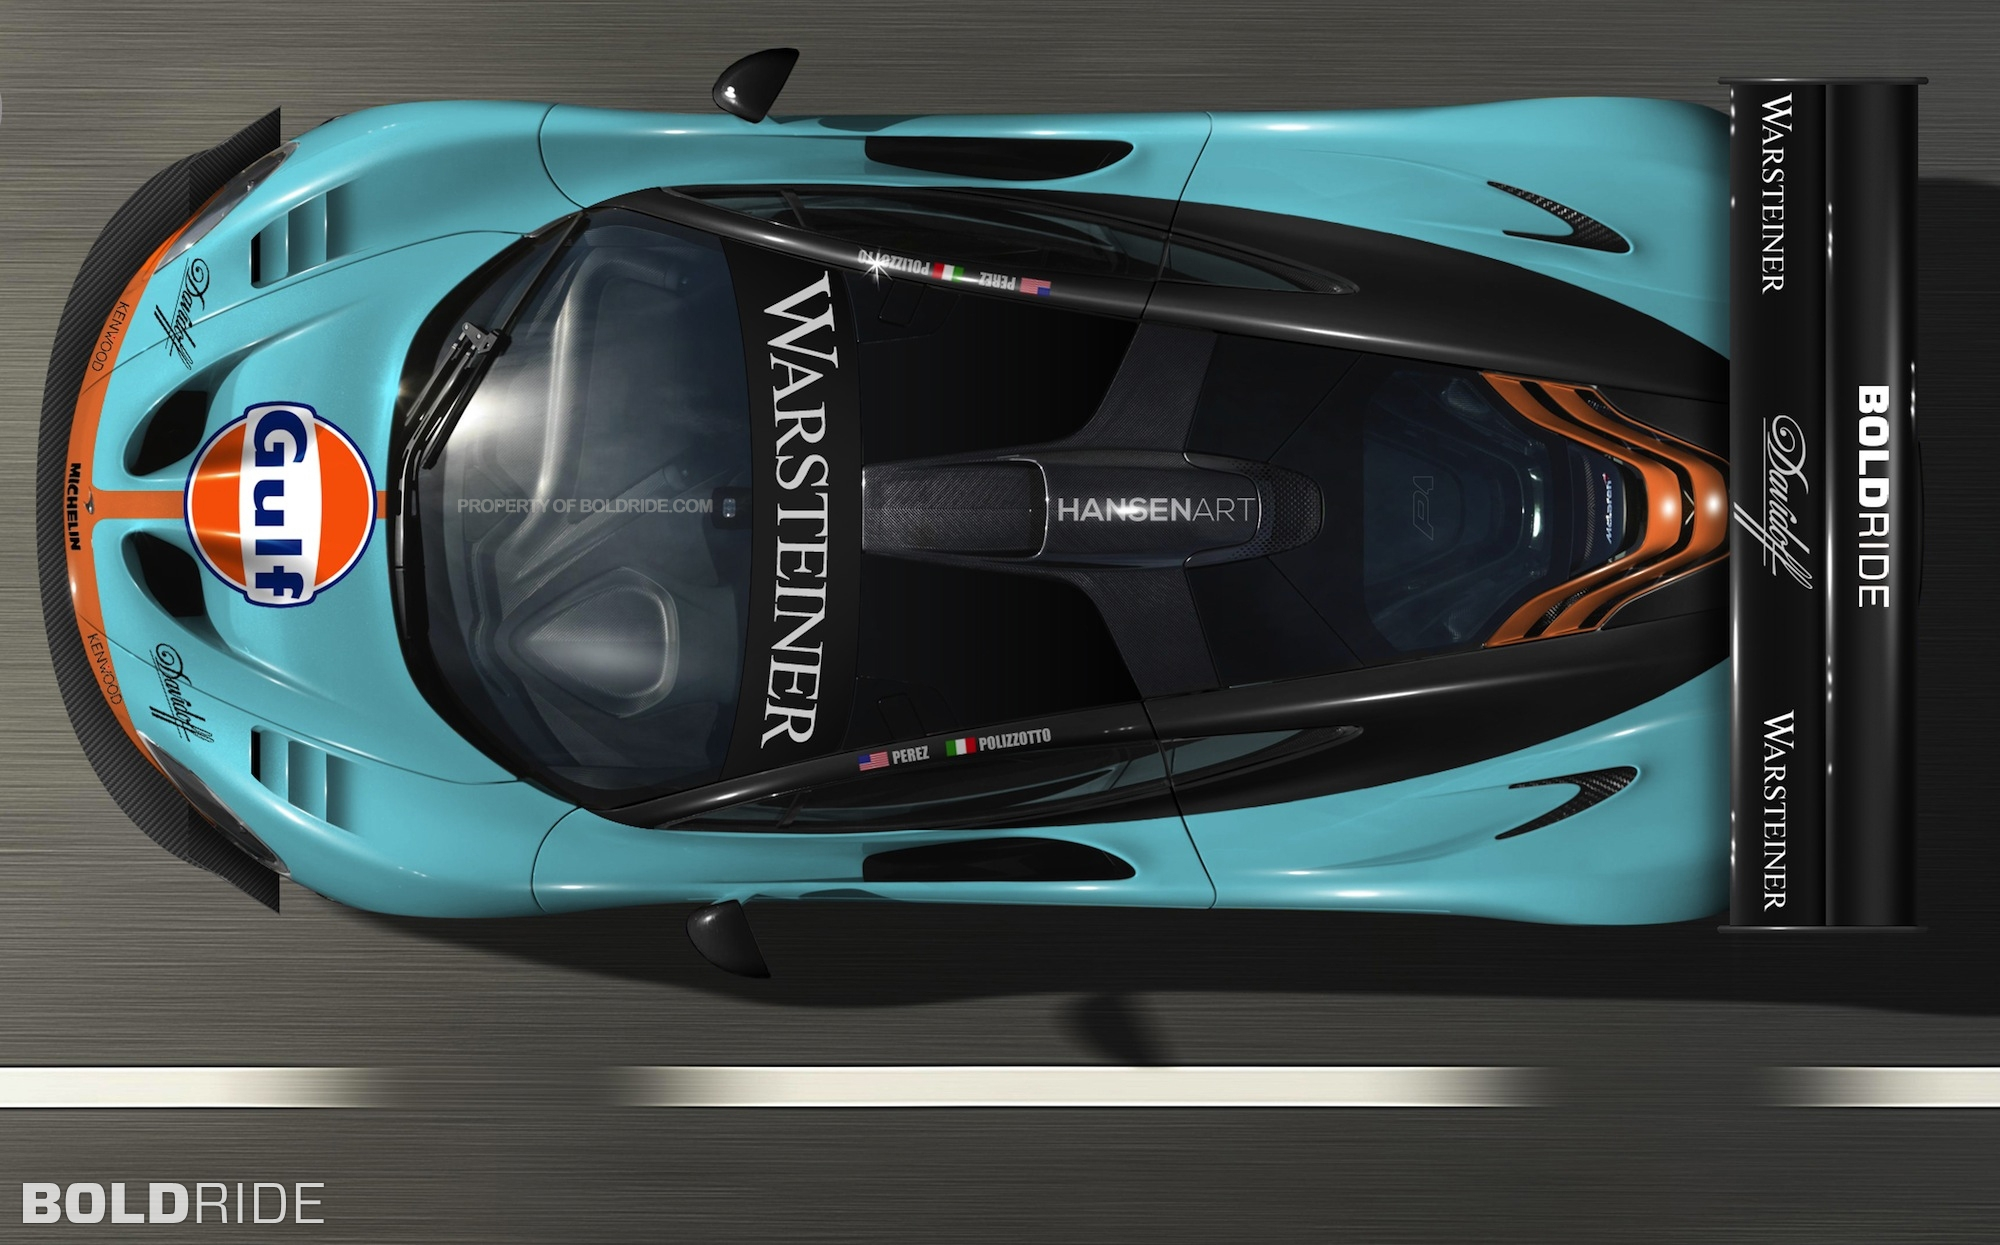 http://images.caradisiac.com/images/5/4/3/9/85439/S0-McLaren-P1-GTR-Gulf-vs-LaFerrari-EVOXX-dans-vos-reves-289154.jpg